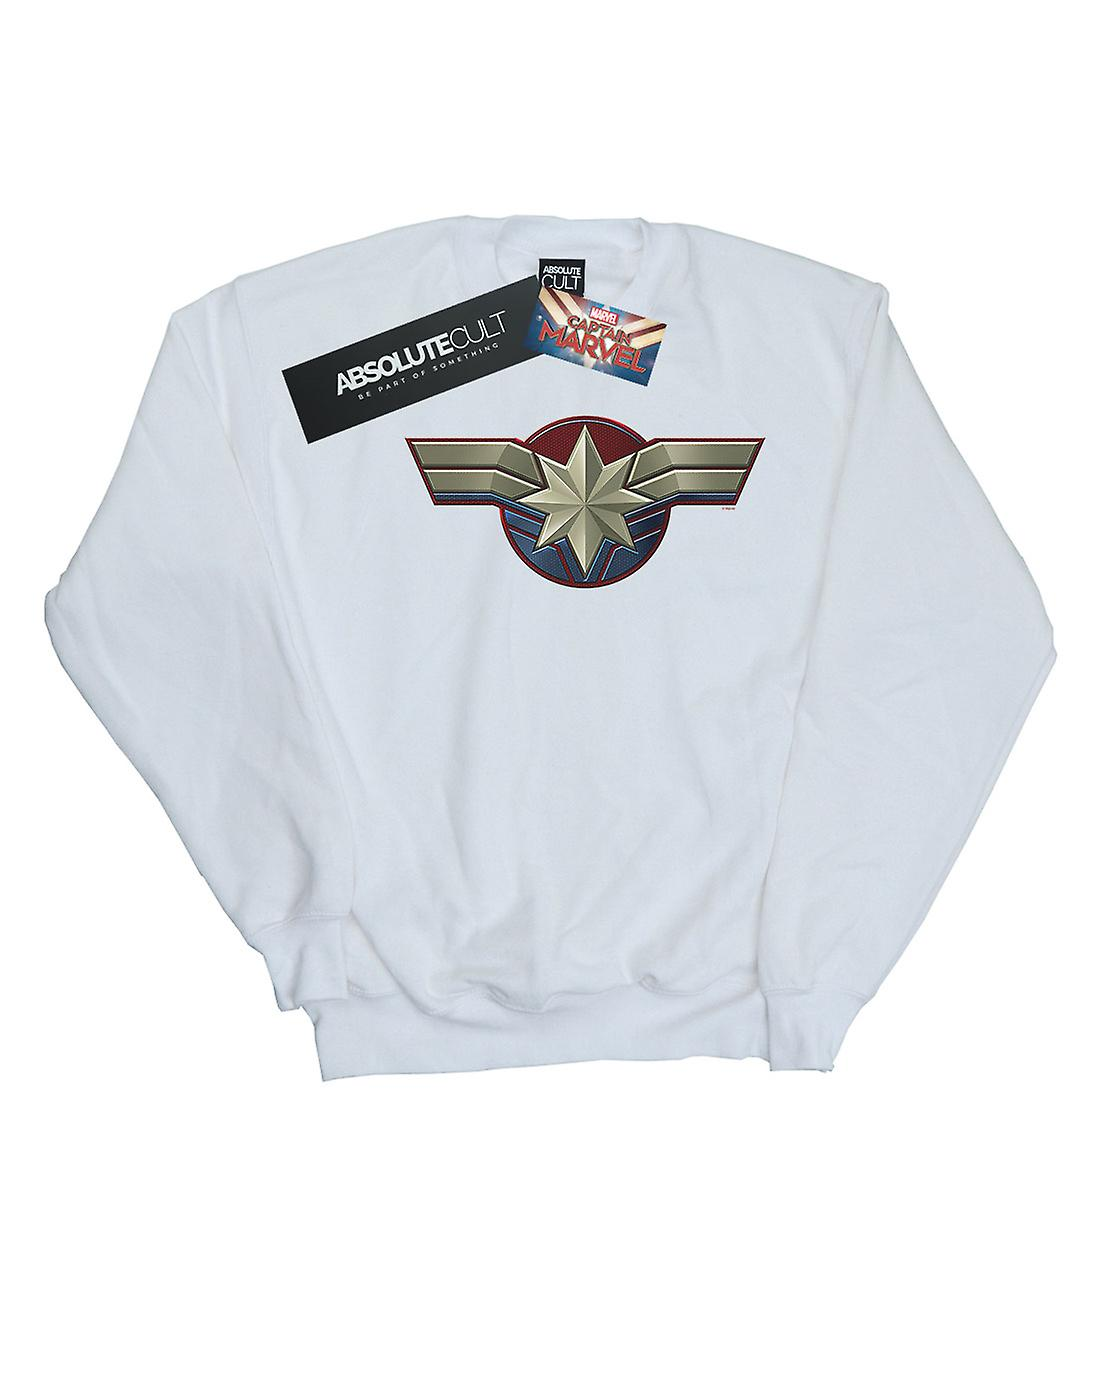 Marvel Girls Captain Marvel Chest Emblem Sweatshirt